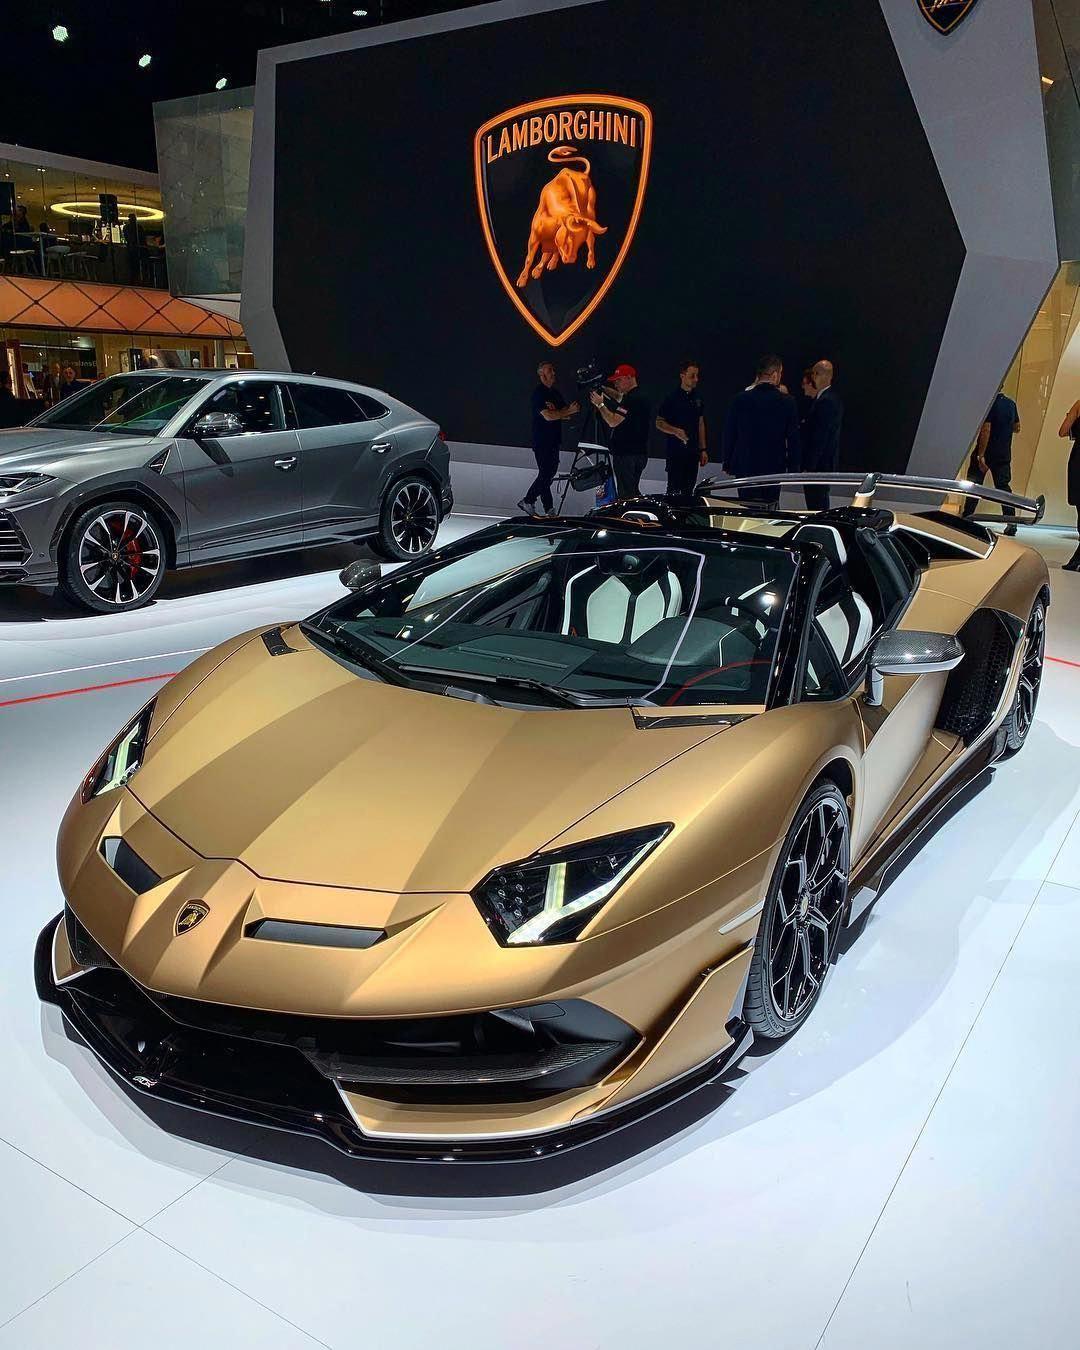 Lamborghini Classic Cars Gif Lamborghiniclassiccars Coffret Cadeau Homme Lamborghini Aventador Voiture Sportive